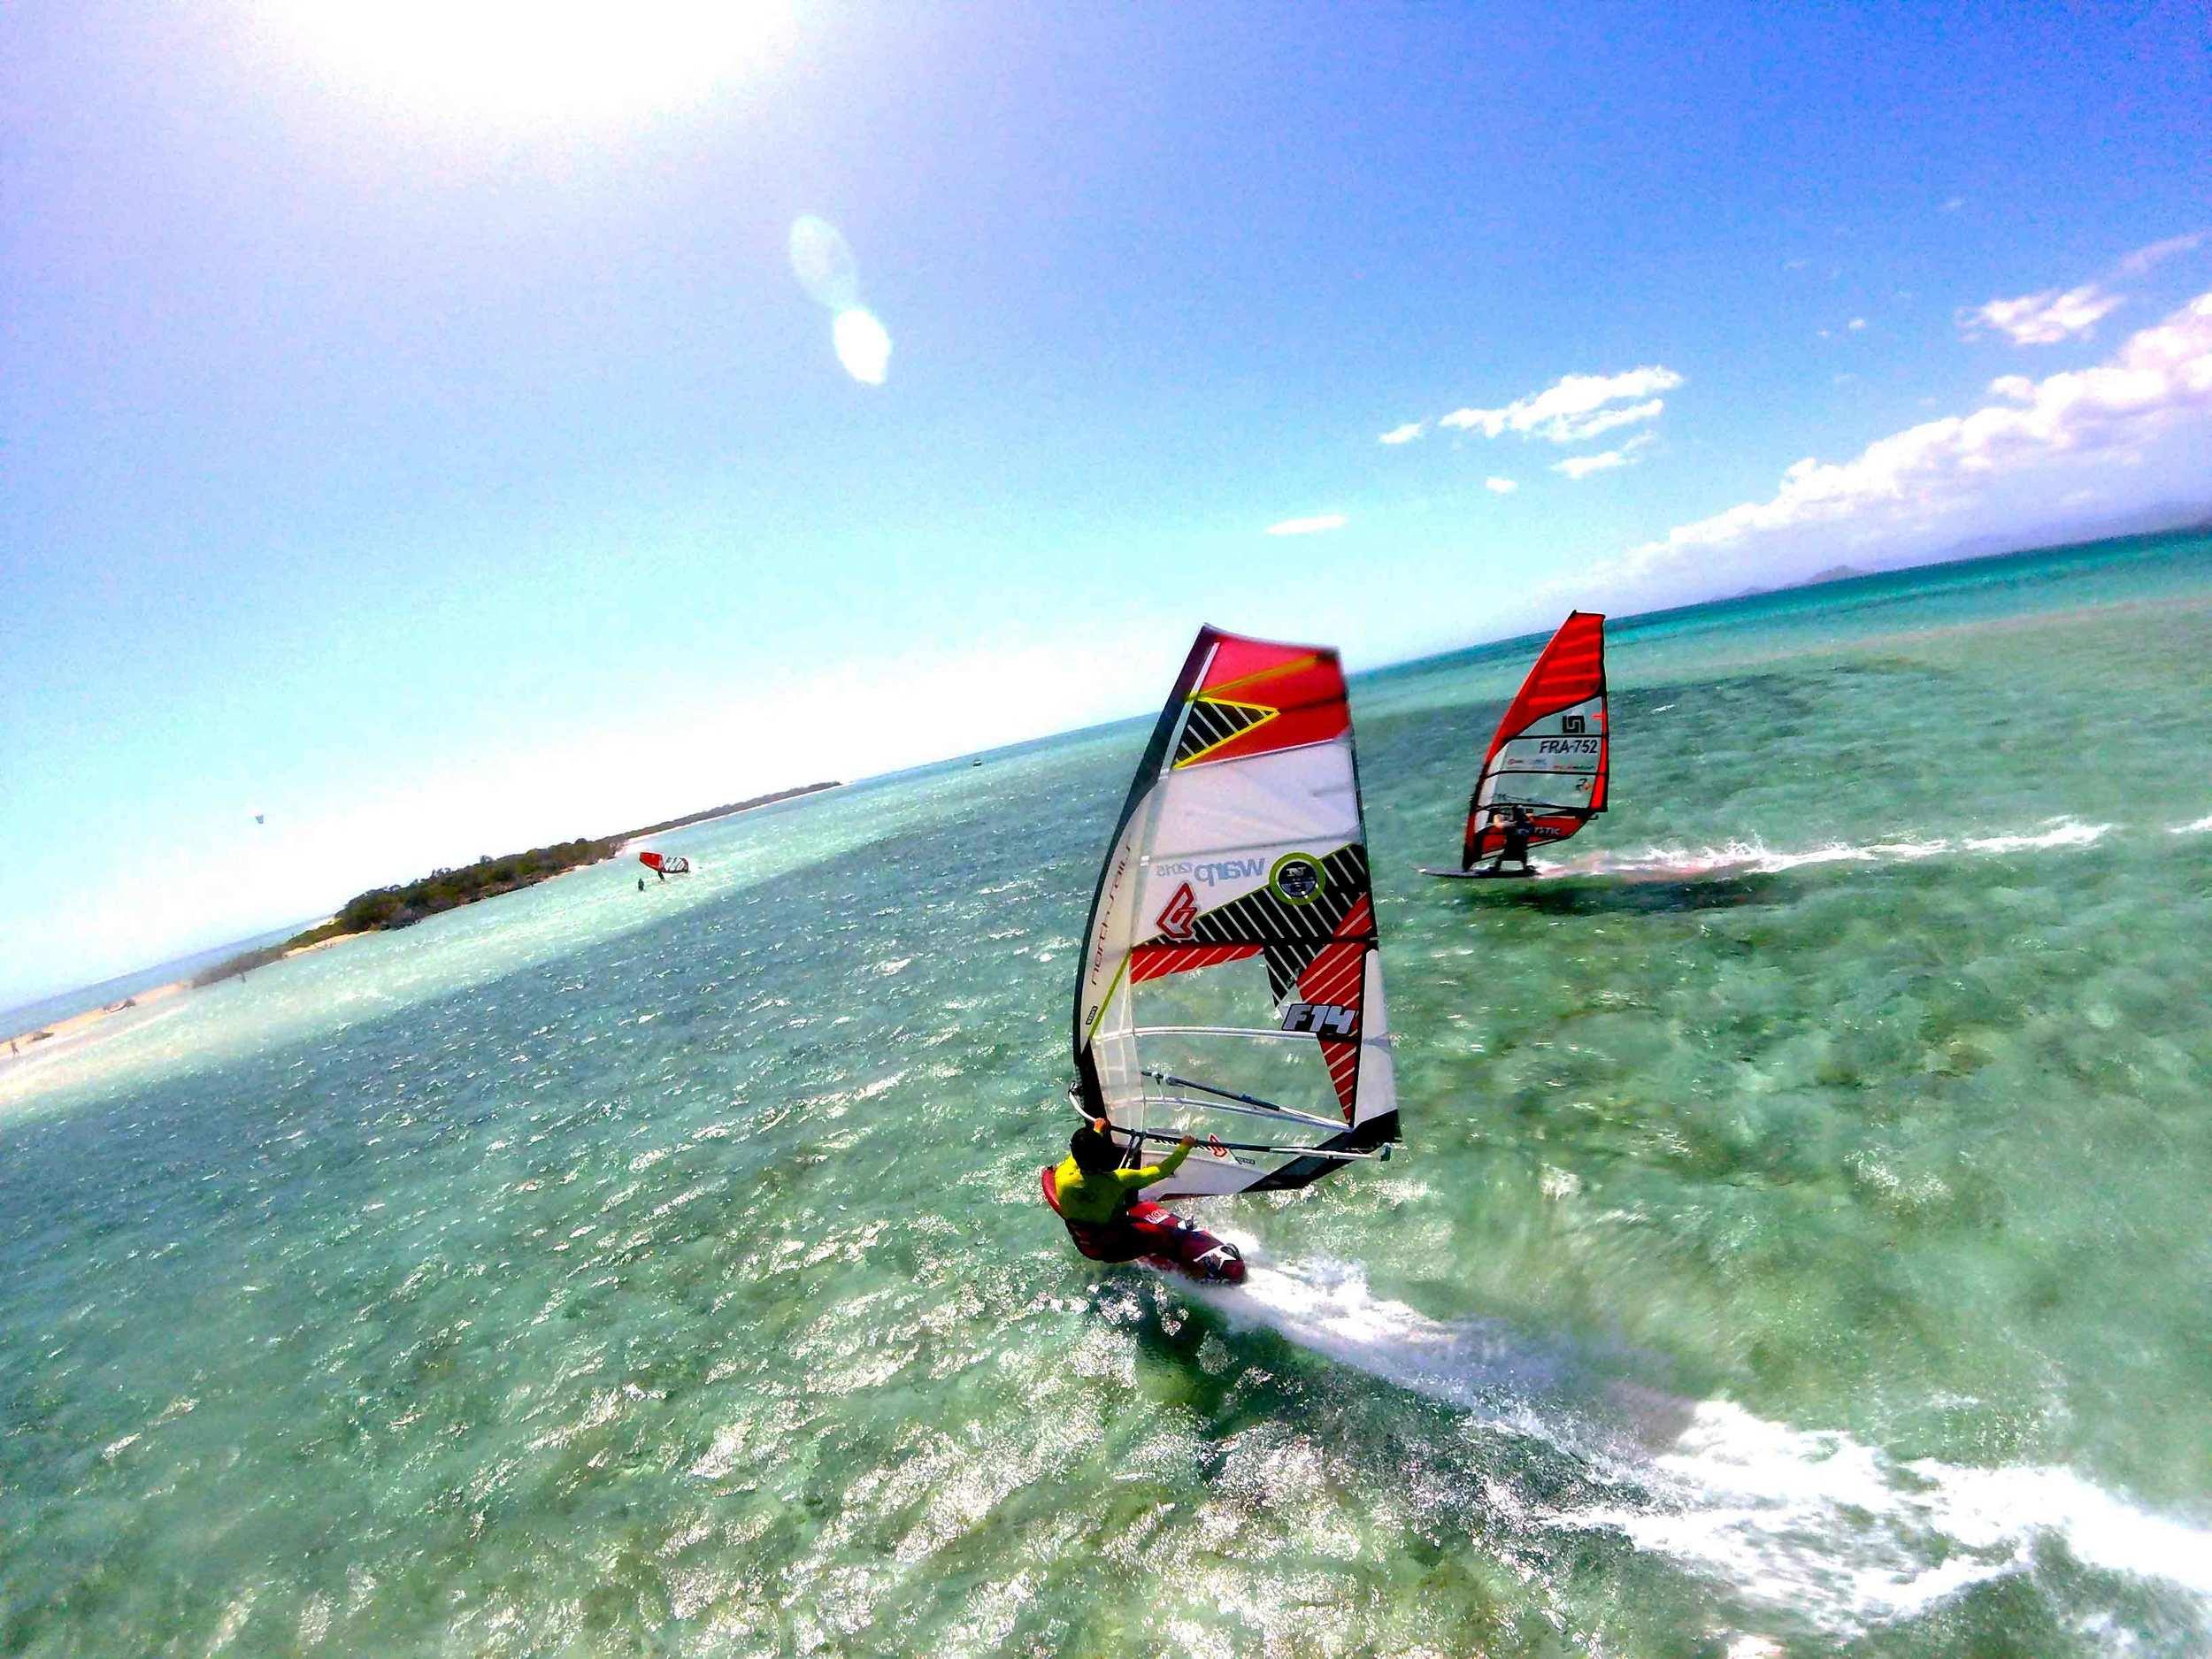 New-Caledonia-web.jpg